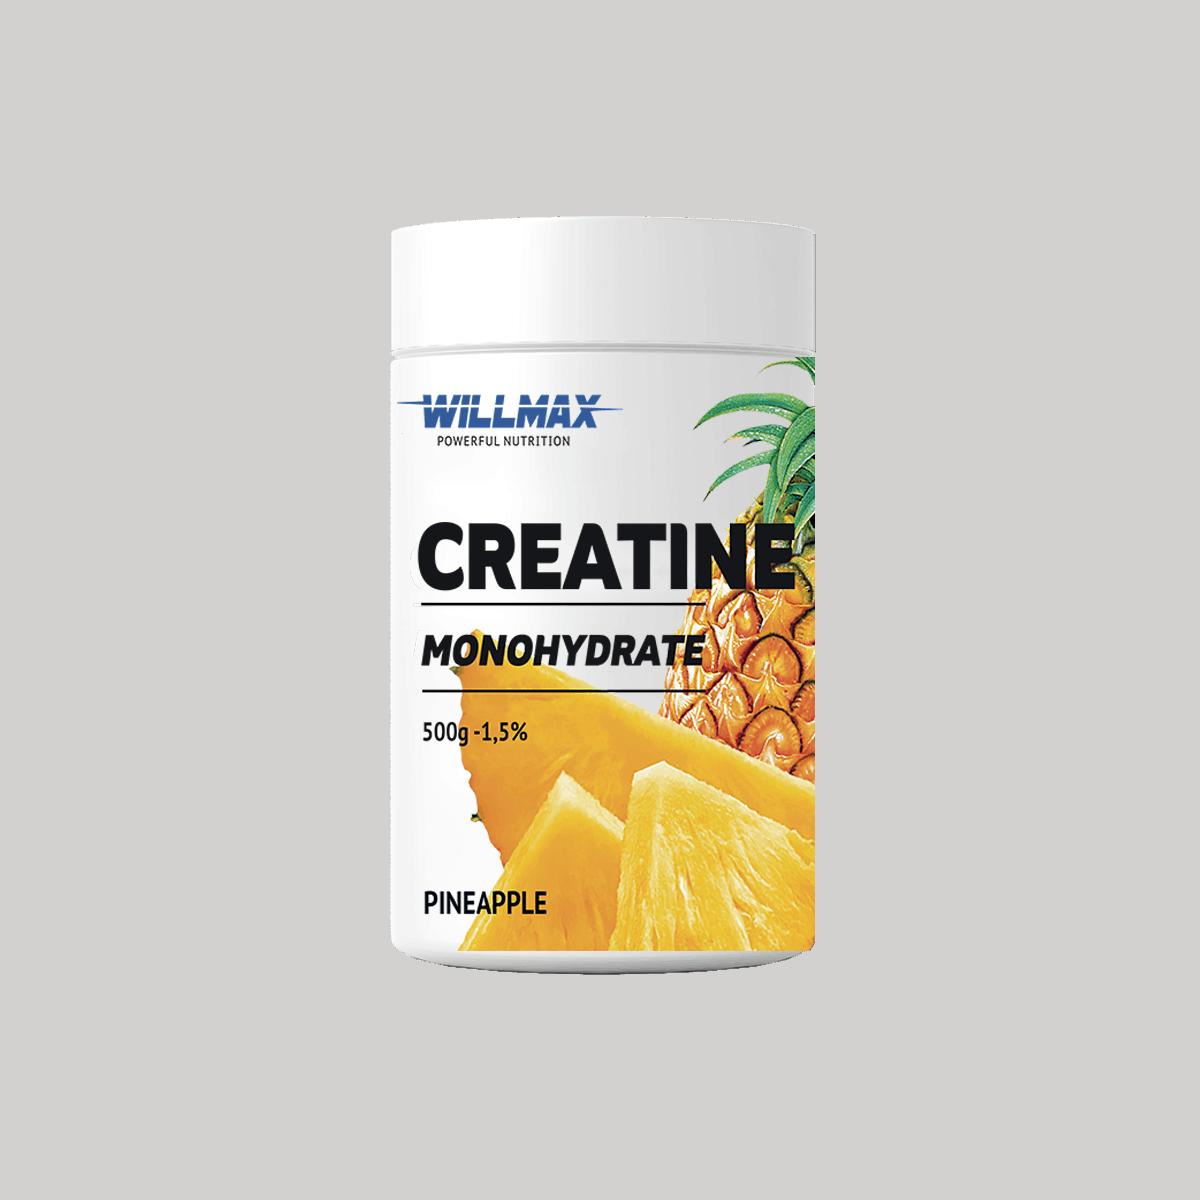 Креатин Willmax Creatine Monohydrate 500g АНАНАС